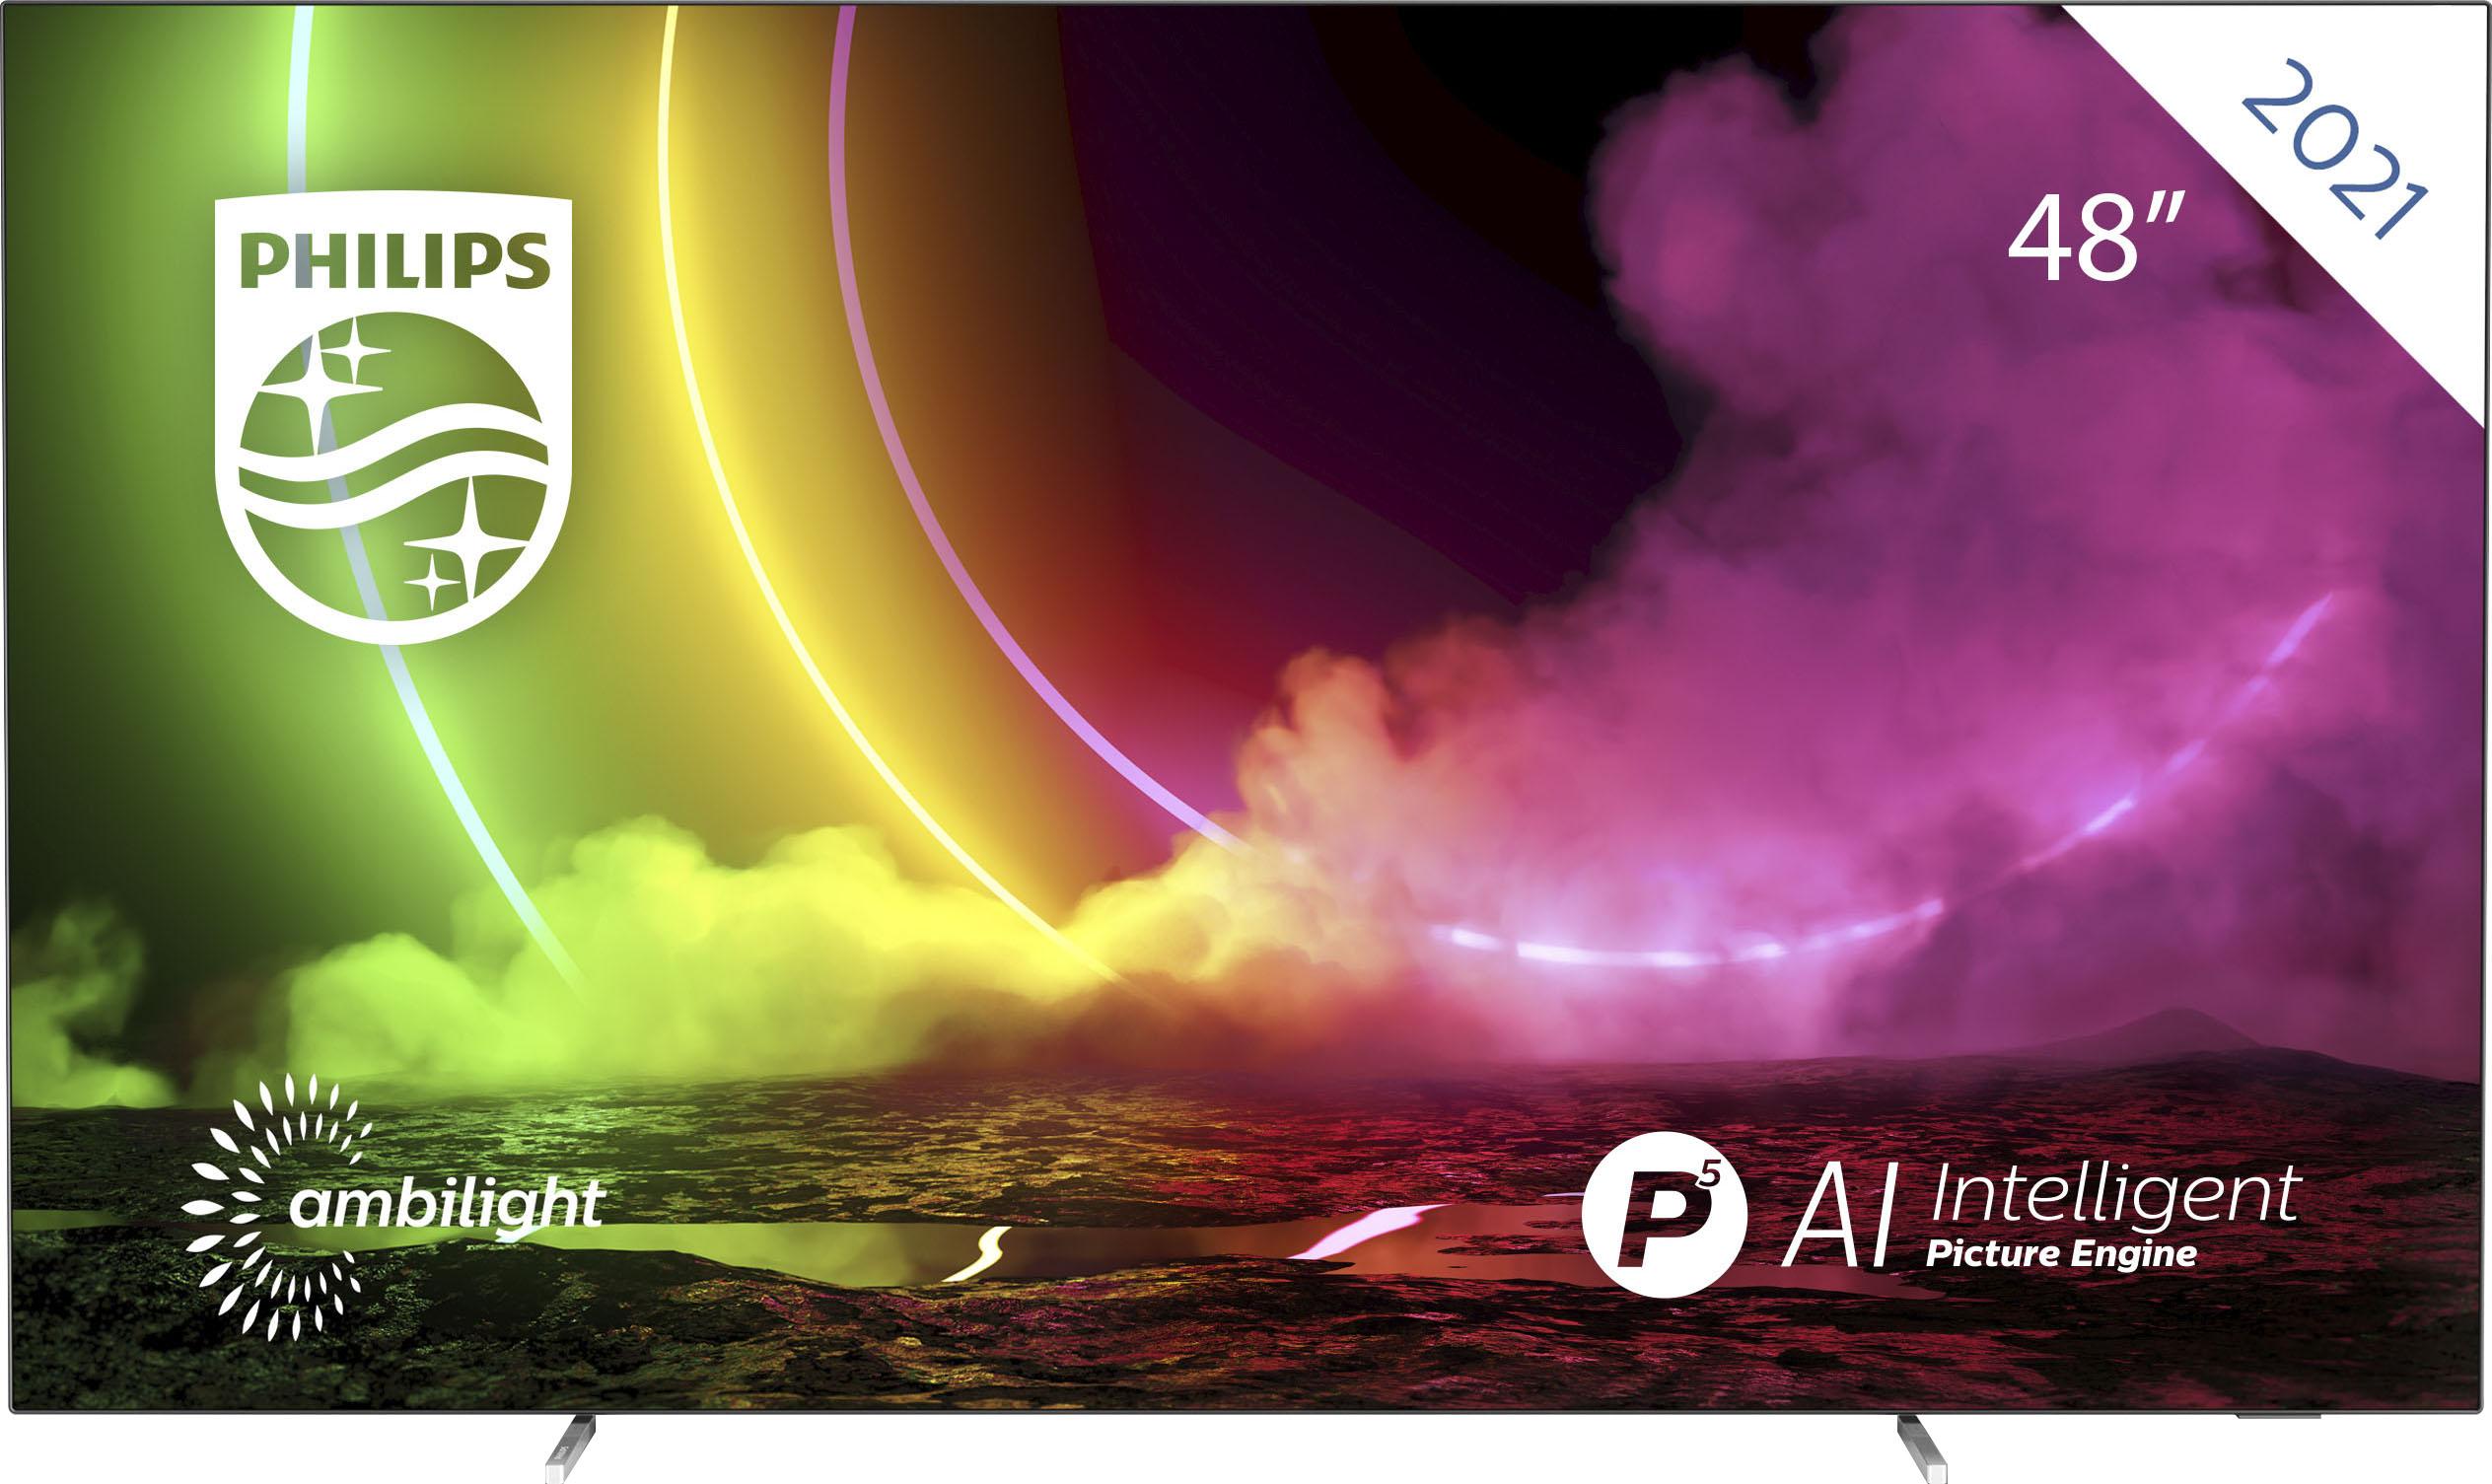 Philips OLED-Fernseher 48OLED806 12 , 121 cm 48 , 4K Ultra HD, Smart-TV